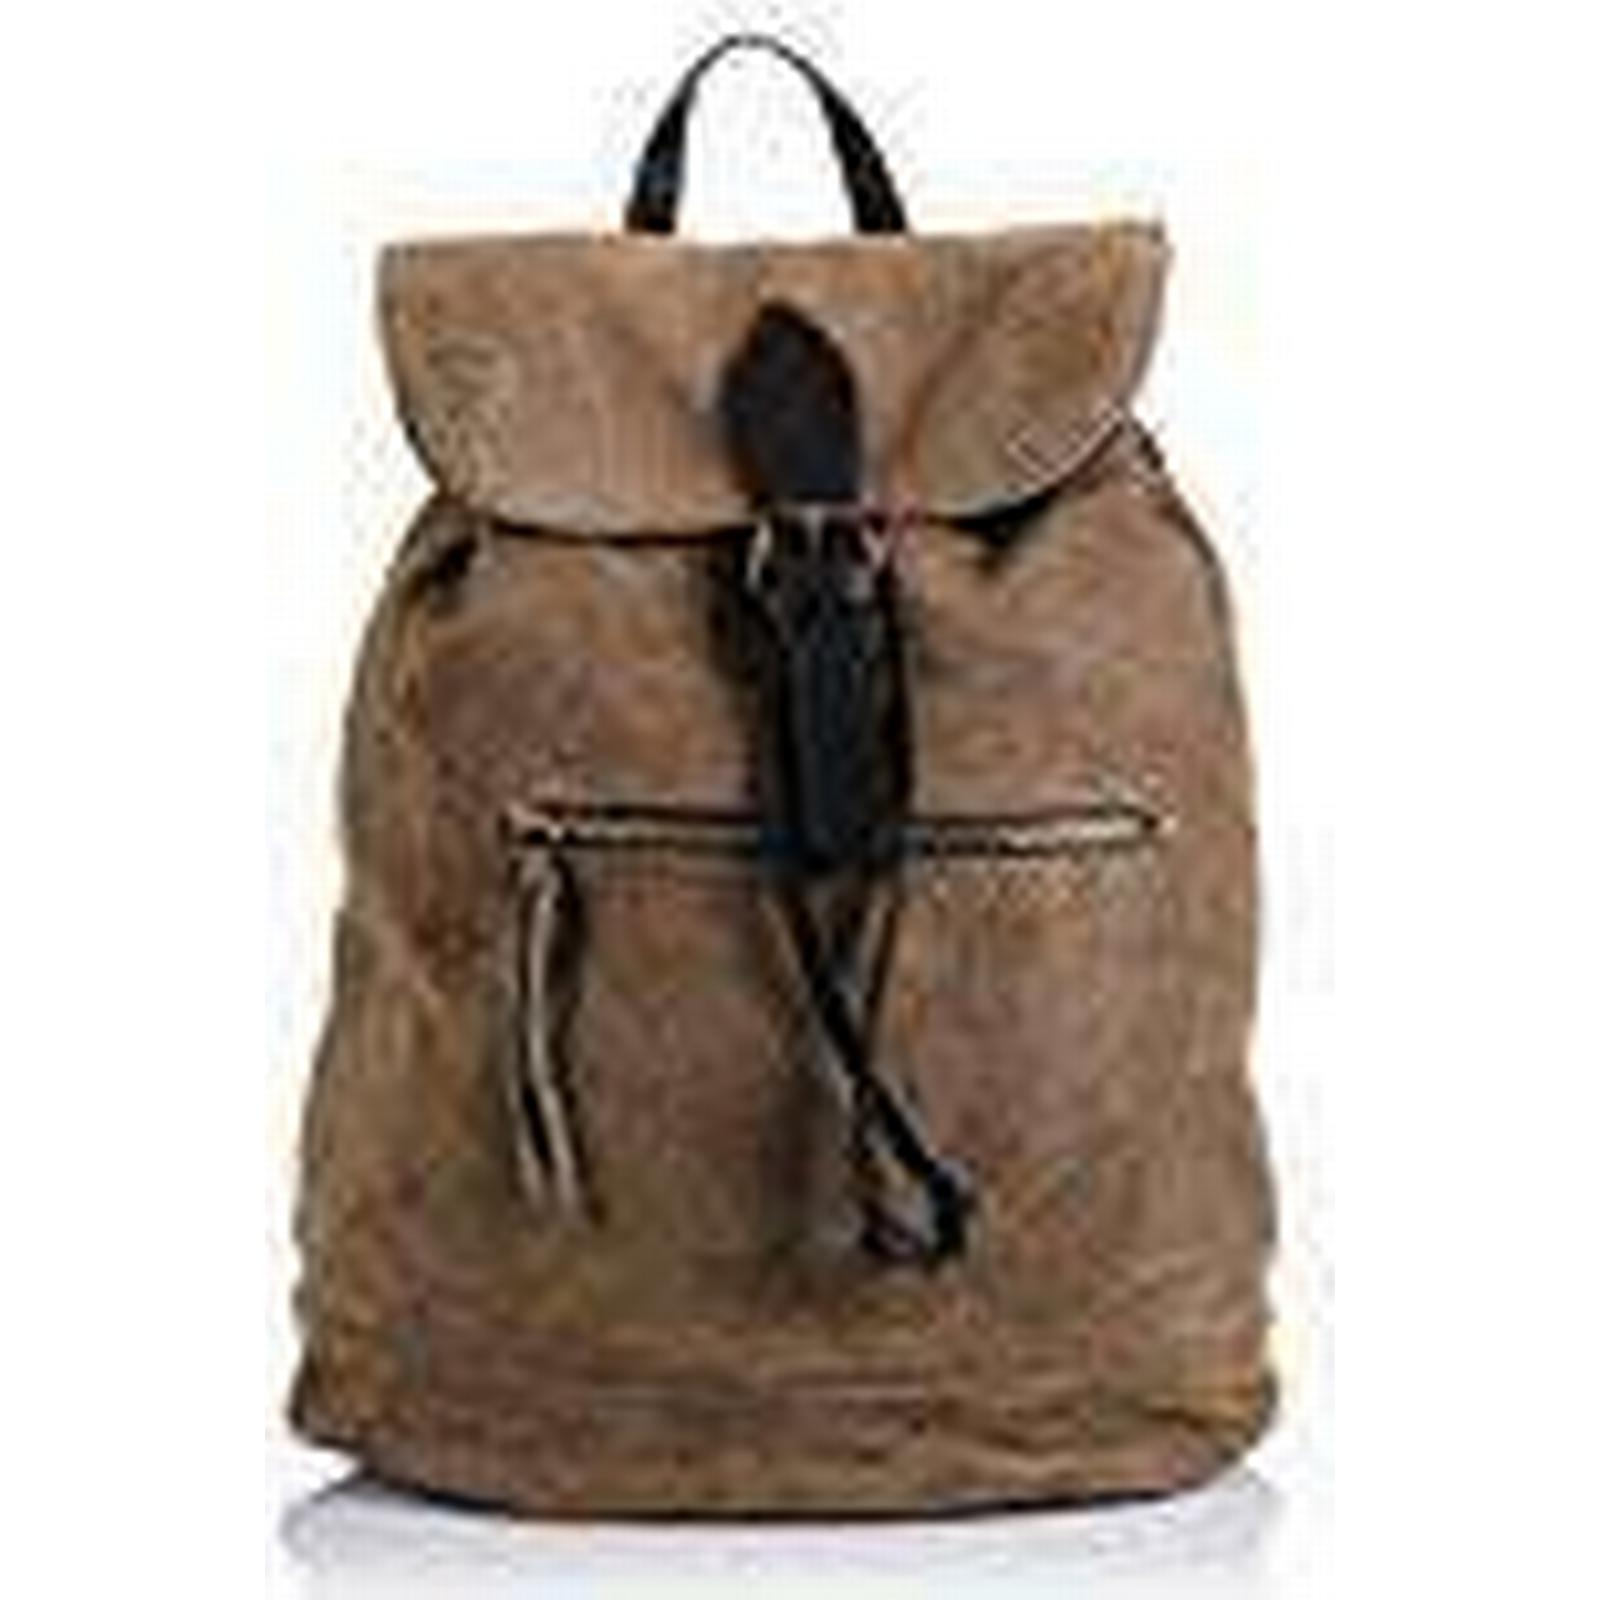 FIRENZE ARTEGIANI Women's Backpack Taupe Taupe Taupe 26bfaa